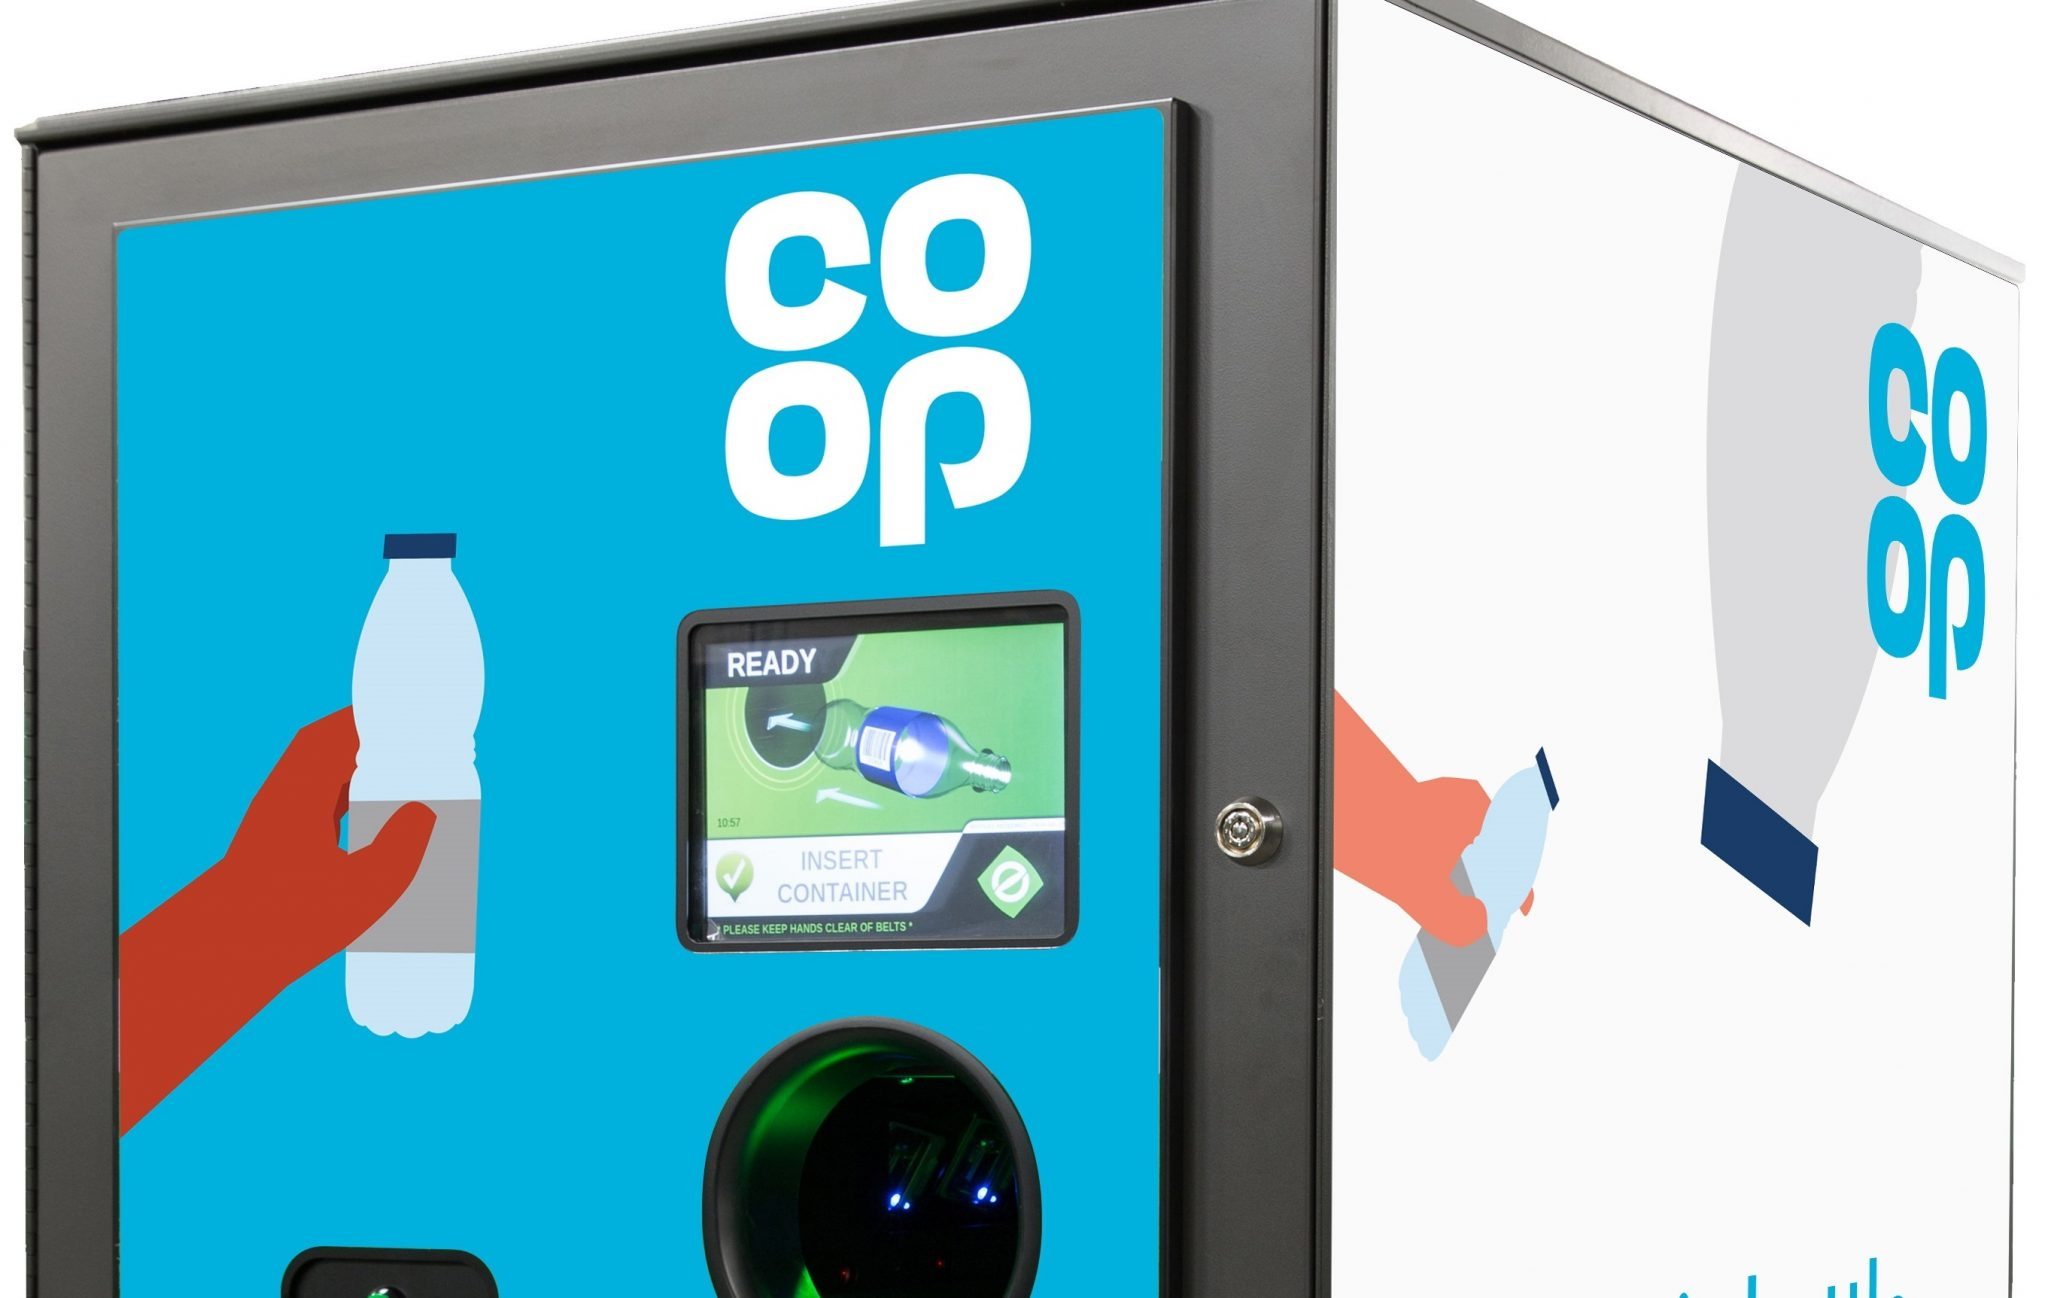 Co-op is in support of a Scottish Deposit Return Scheme